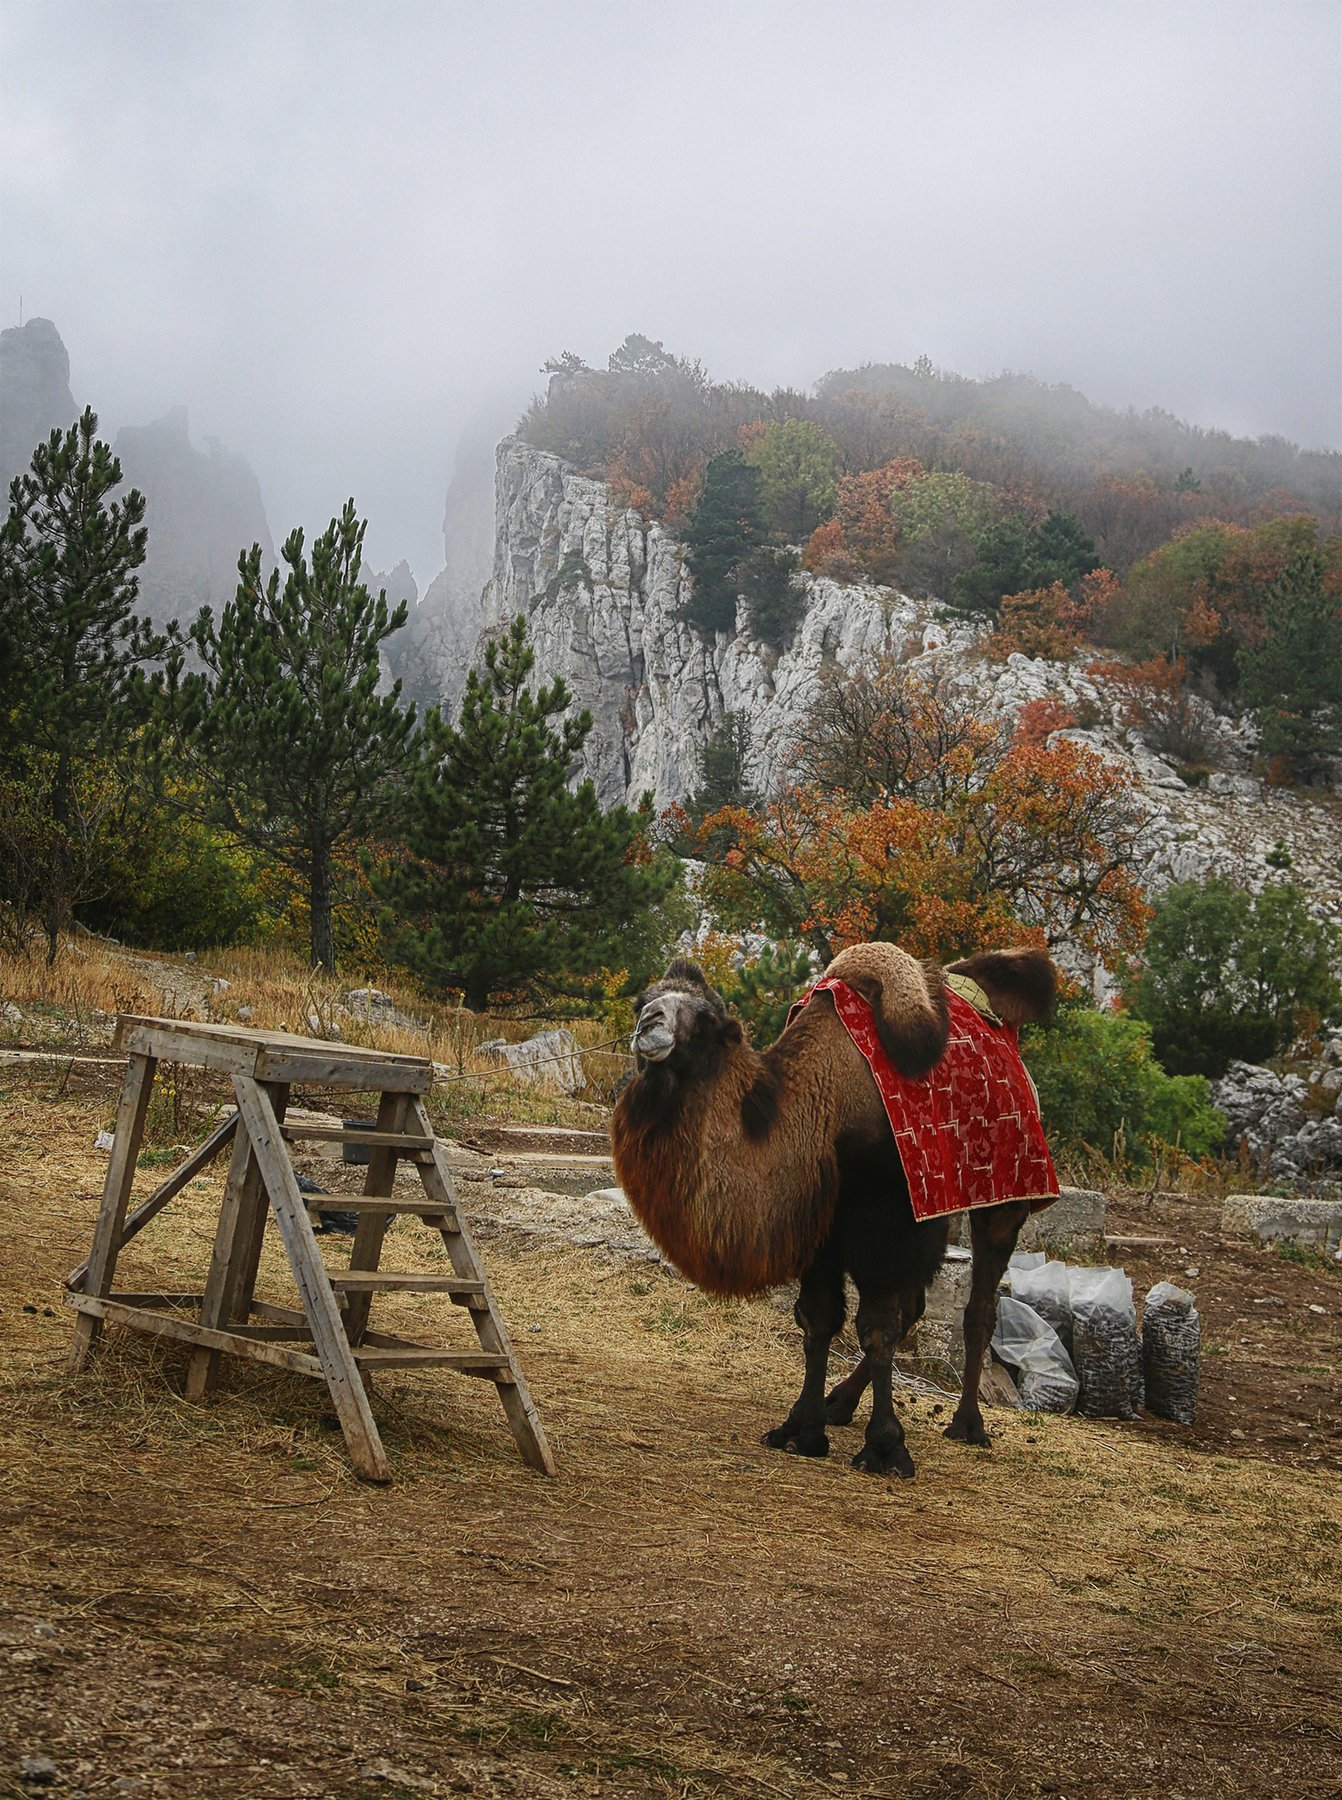 Ай-Петри, склон, верблюд, туман, БАРДЕНЦЕВ Александр